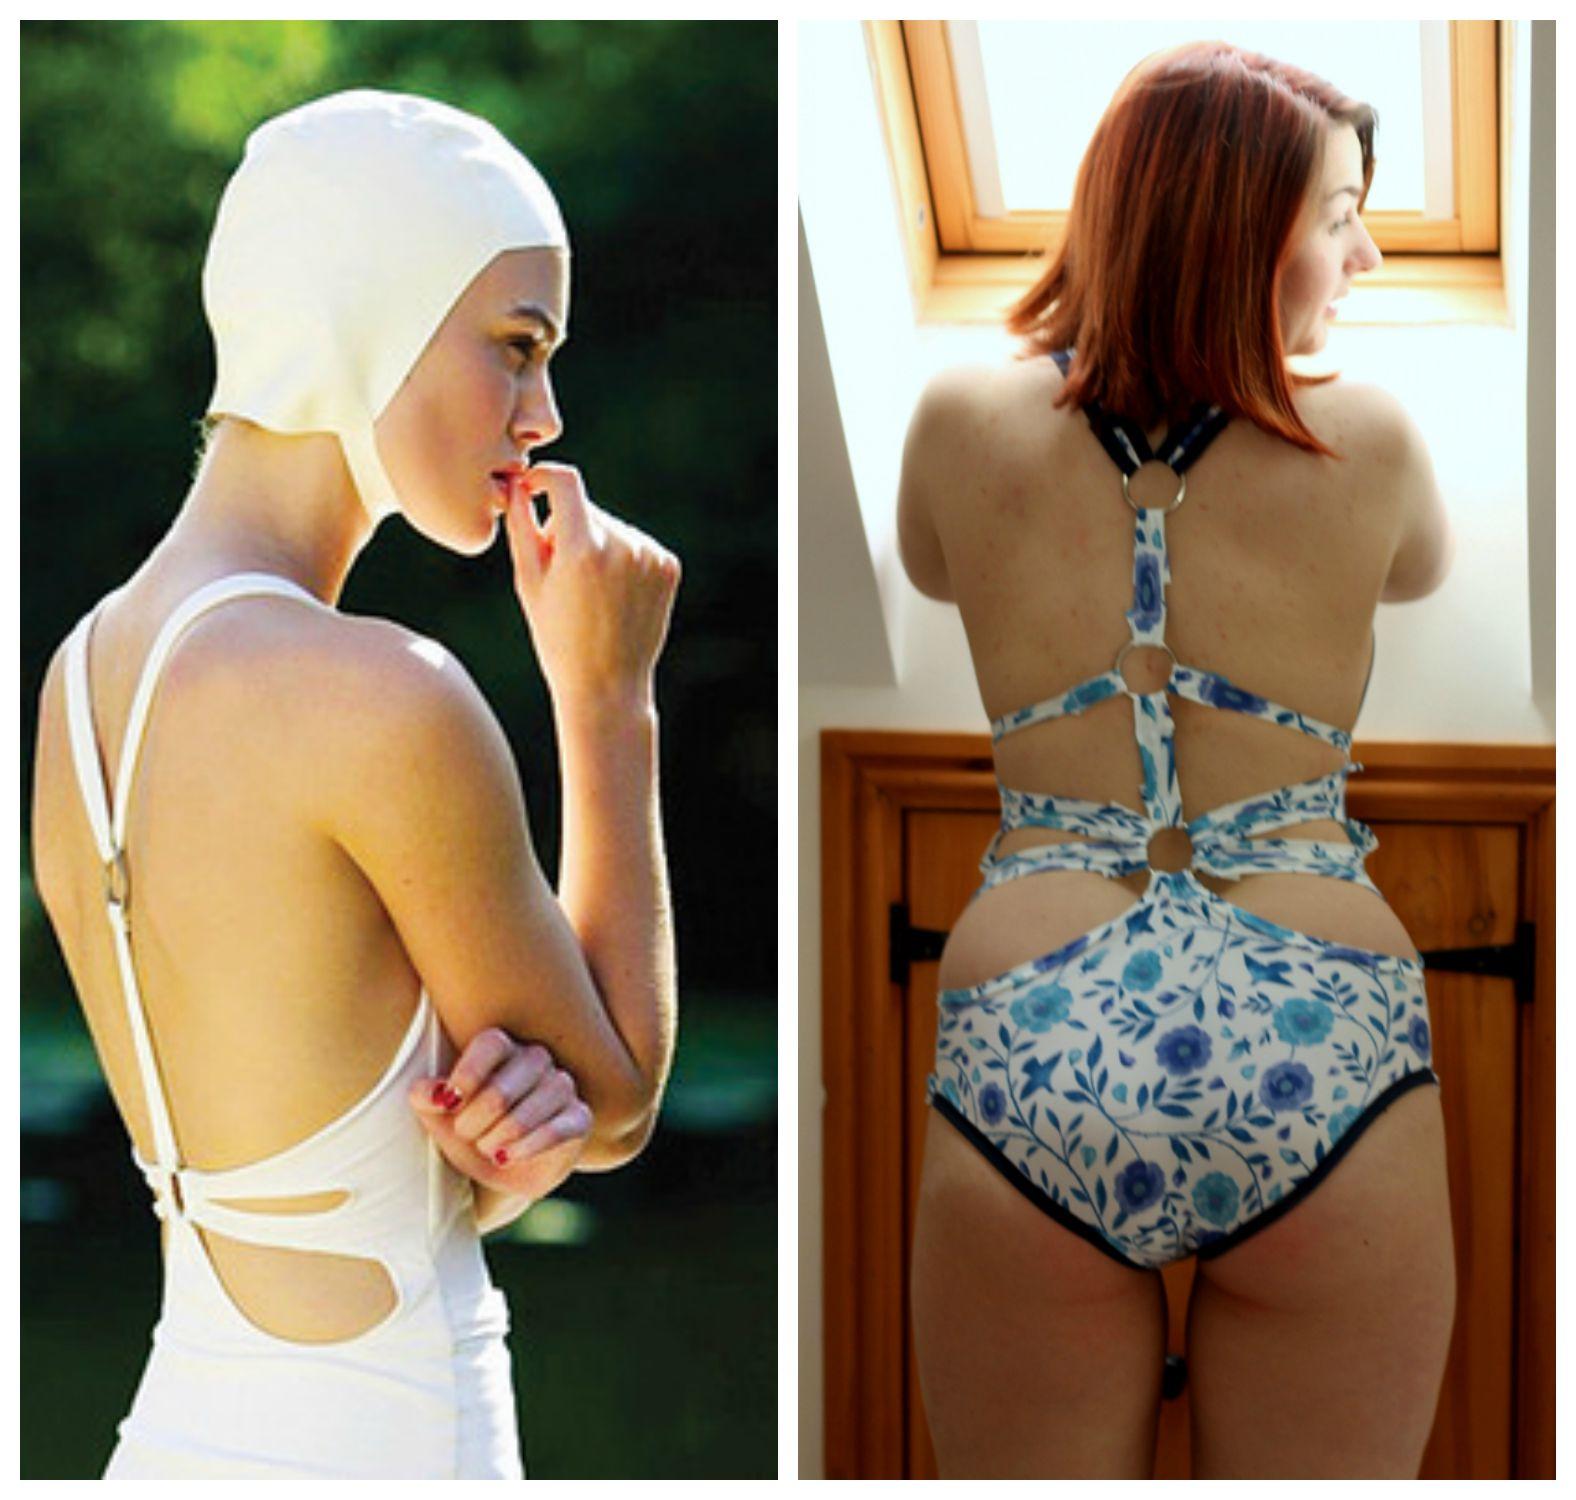 Keira Knightley Bikini Pics photo 8